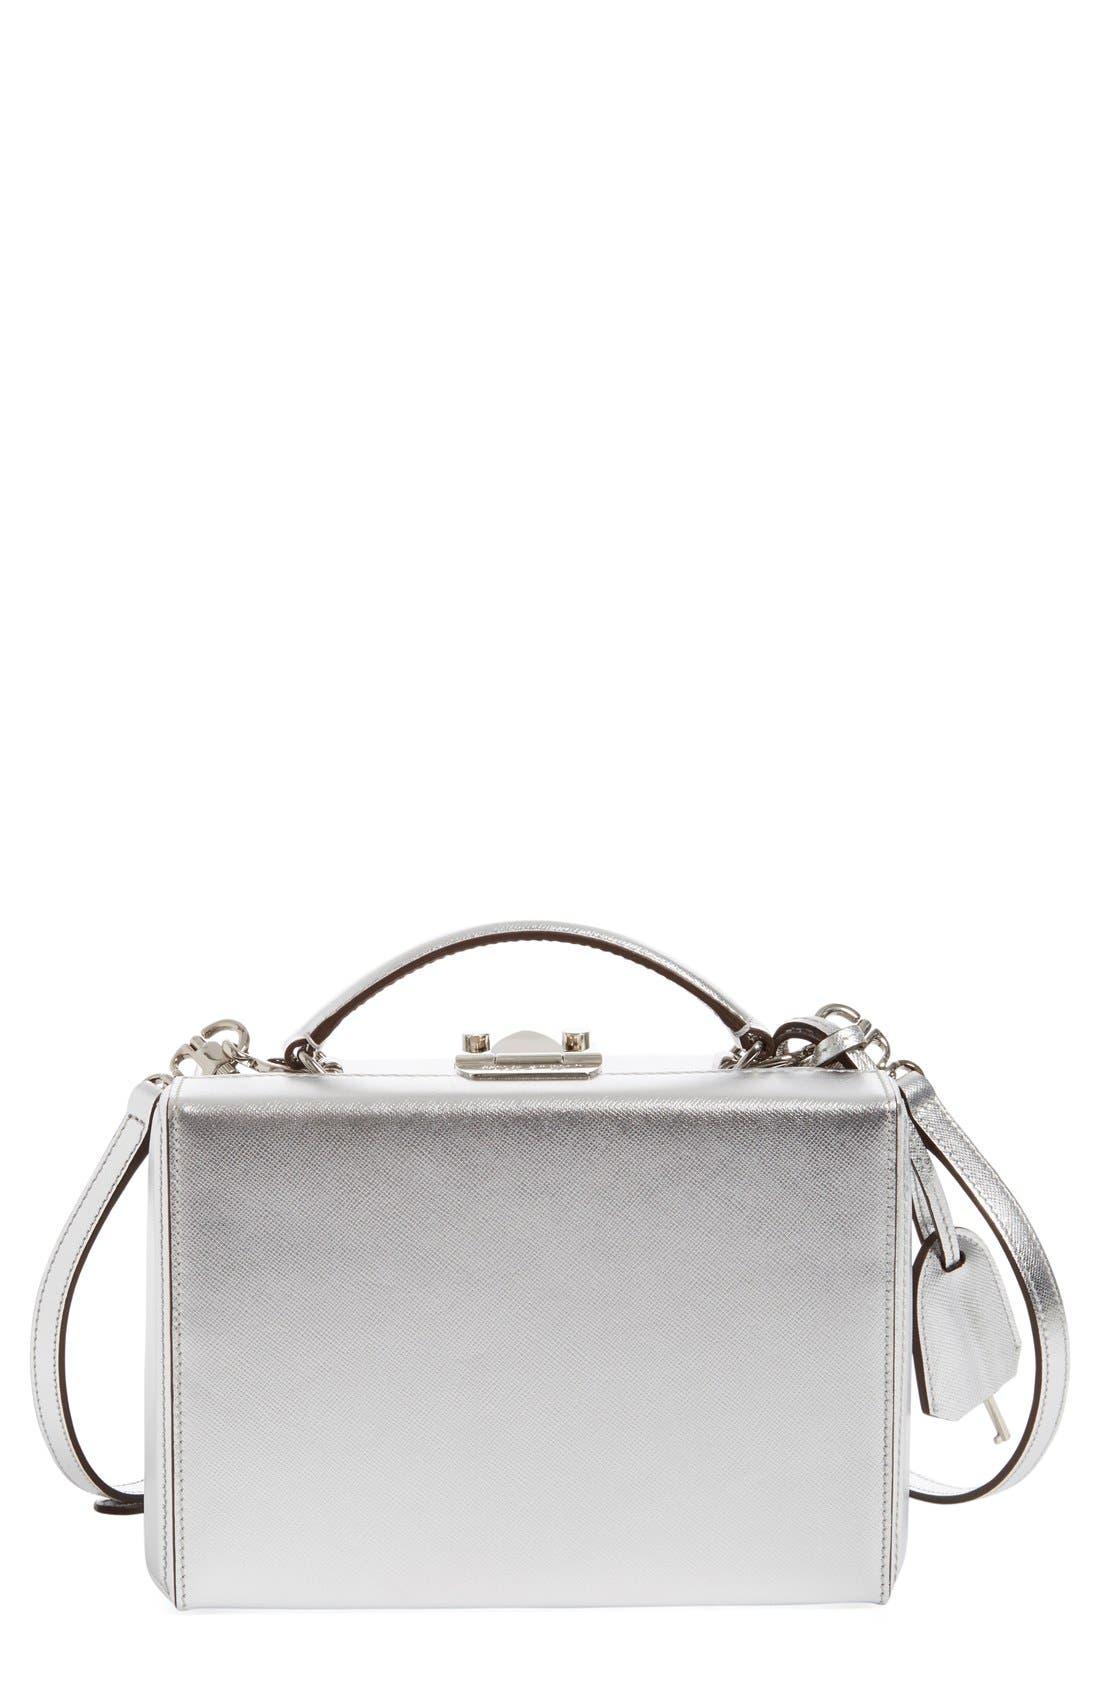 Alternate Image 1 Selected - Mark Cross 'Small Grace' Metallic Saffiano Leather Box Clutch